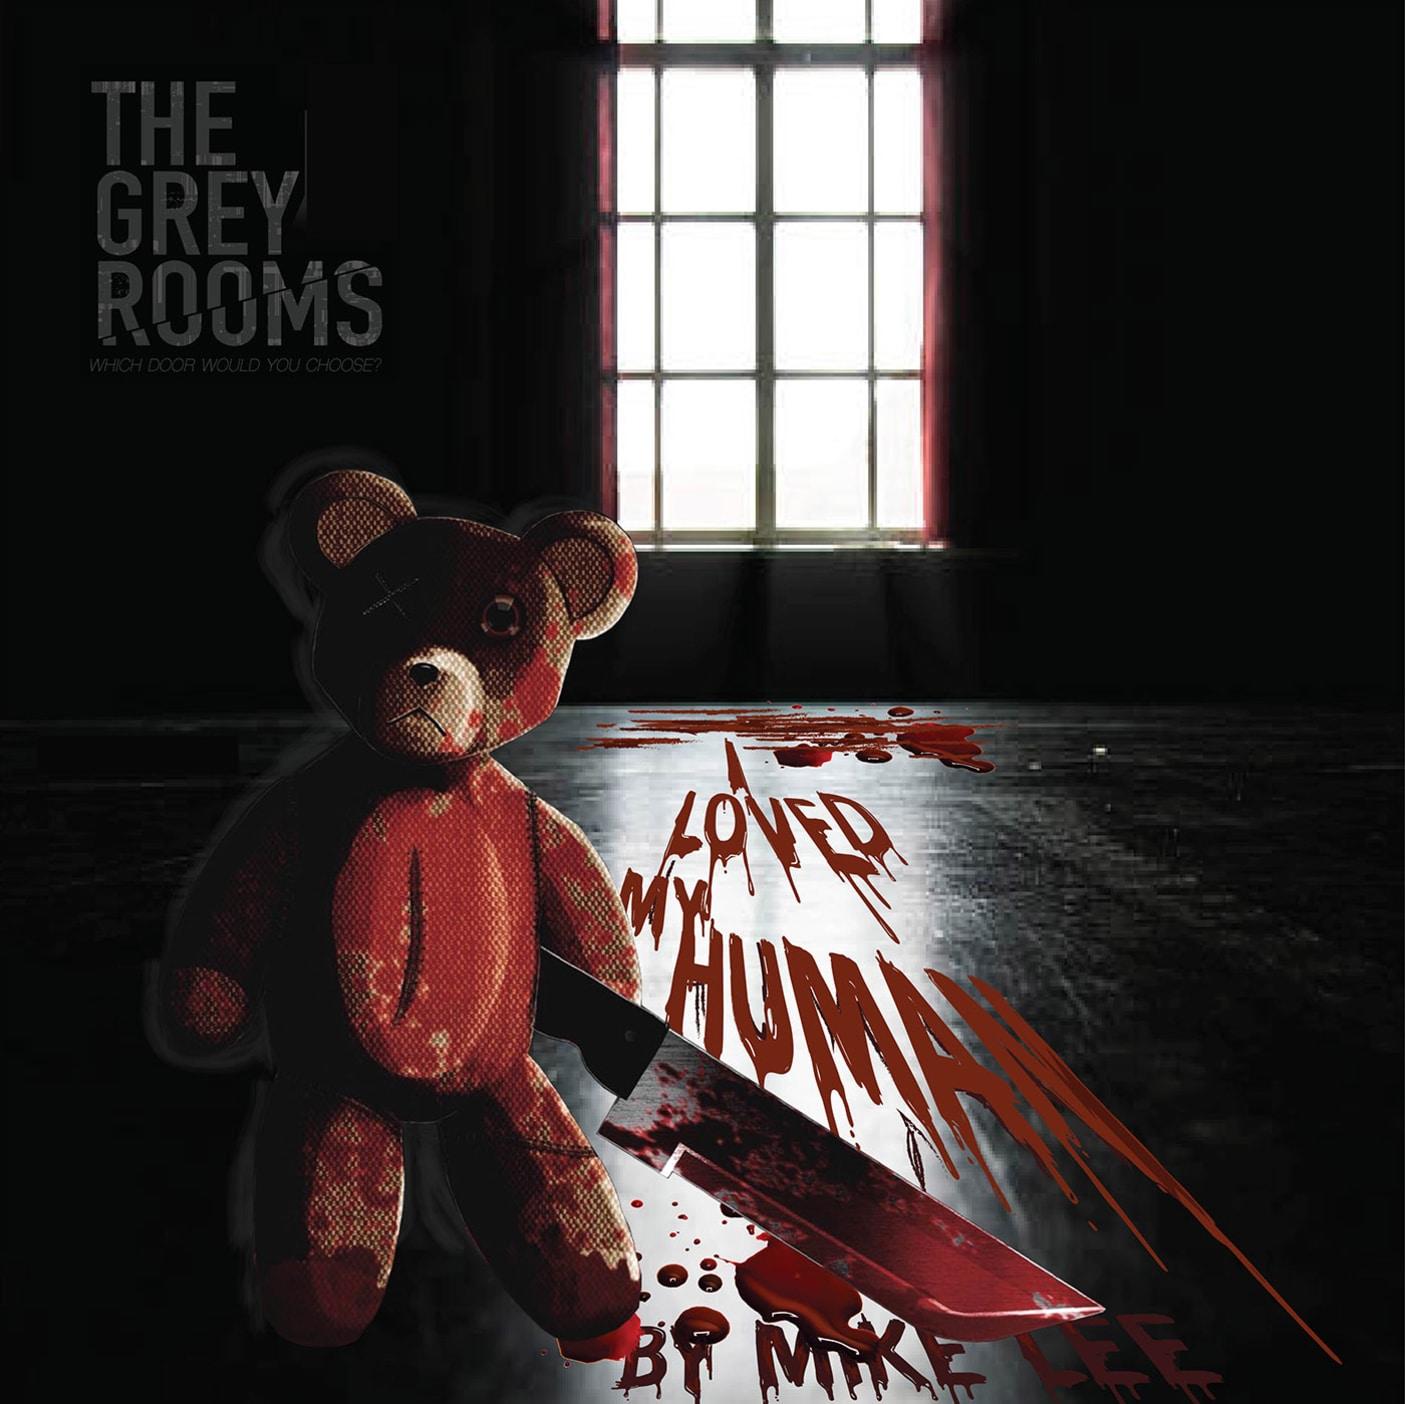 S1E2 - Room #317 - I Loved My Human